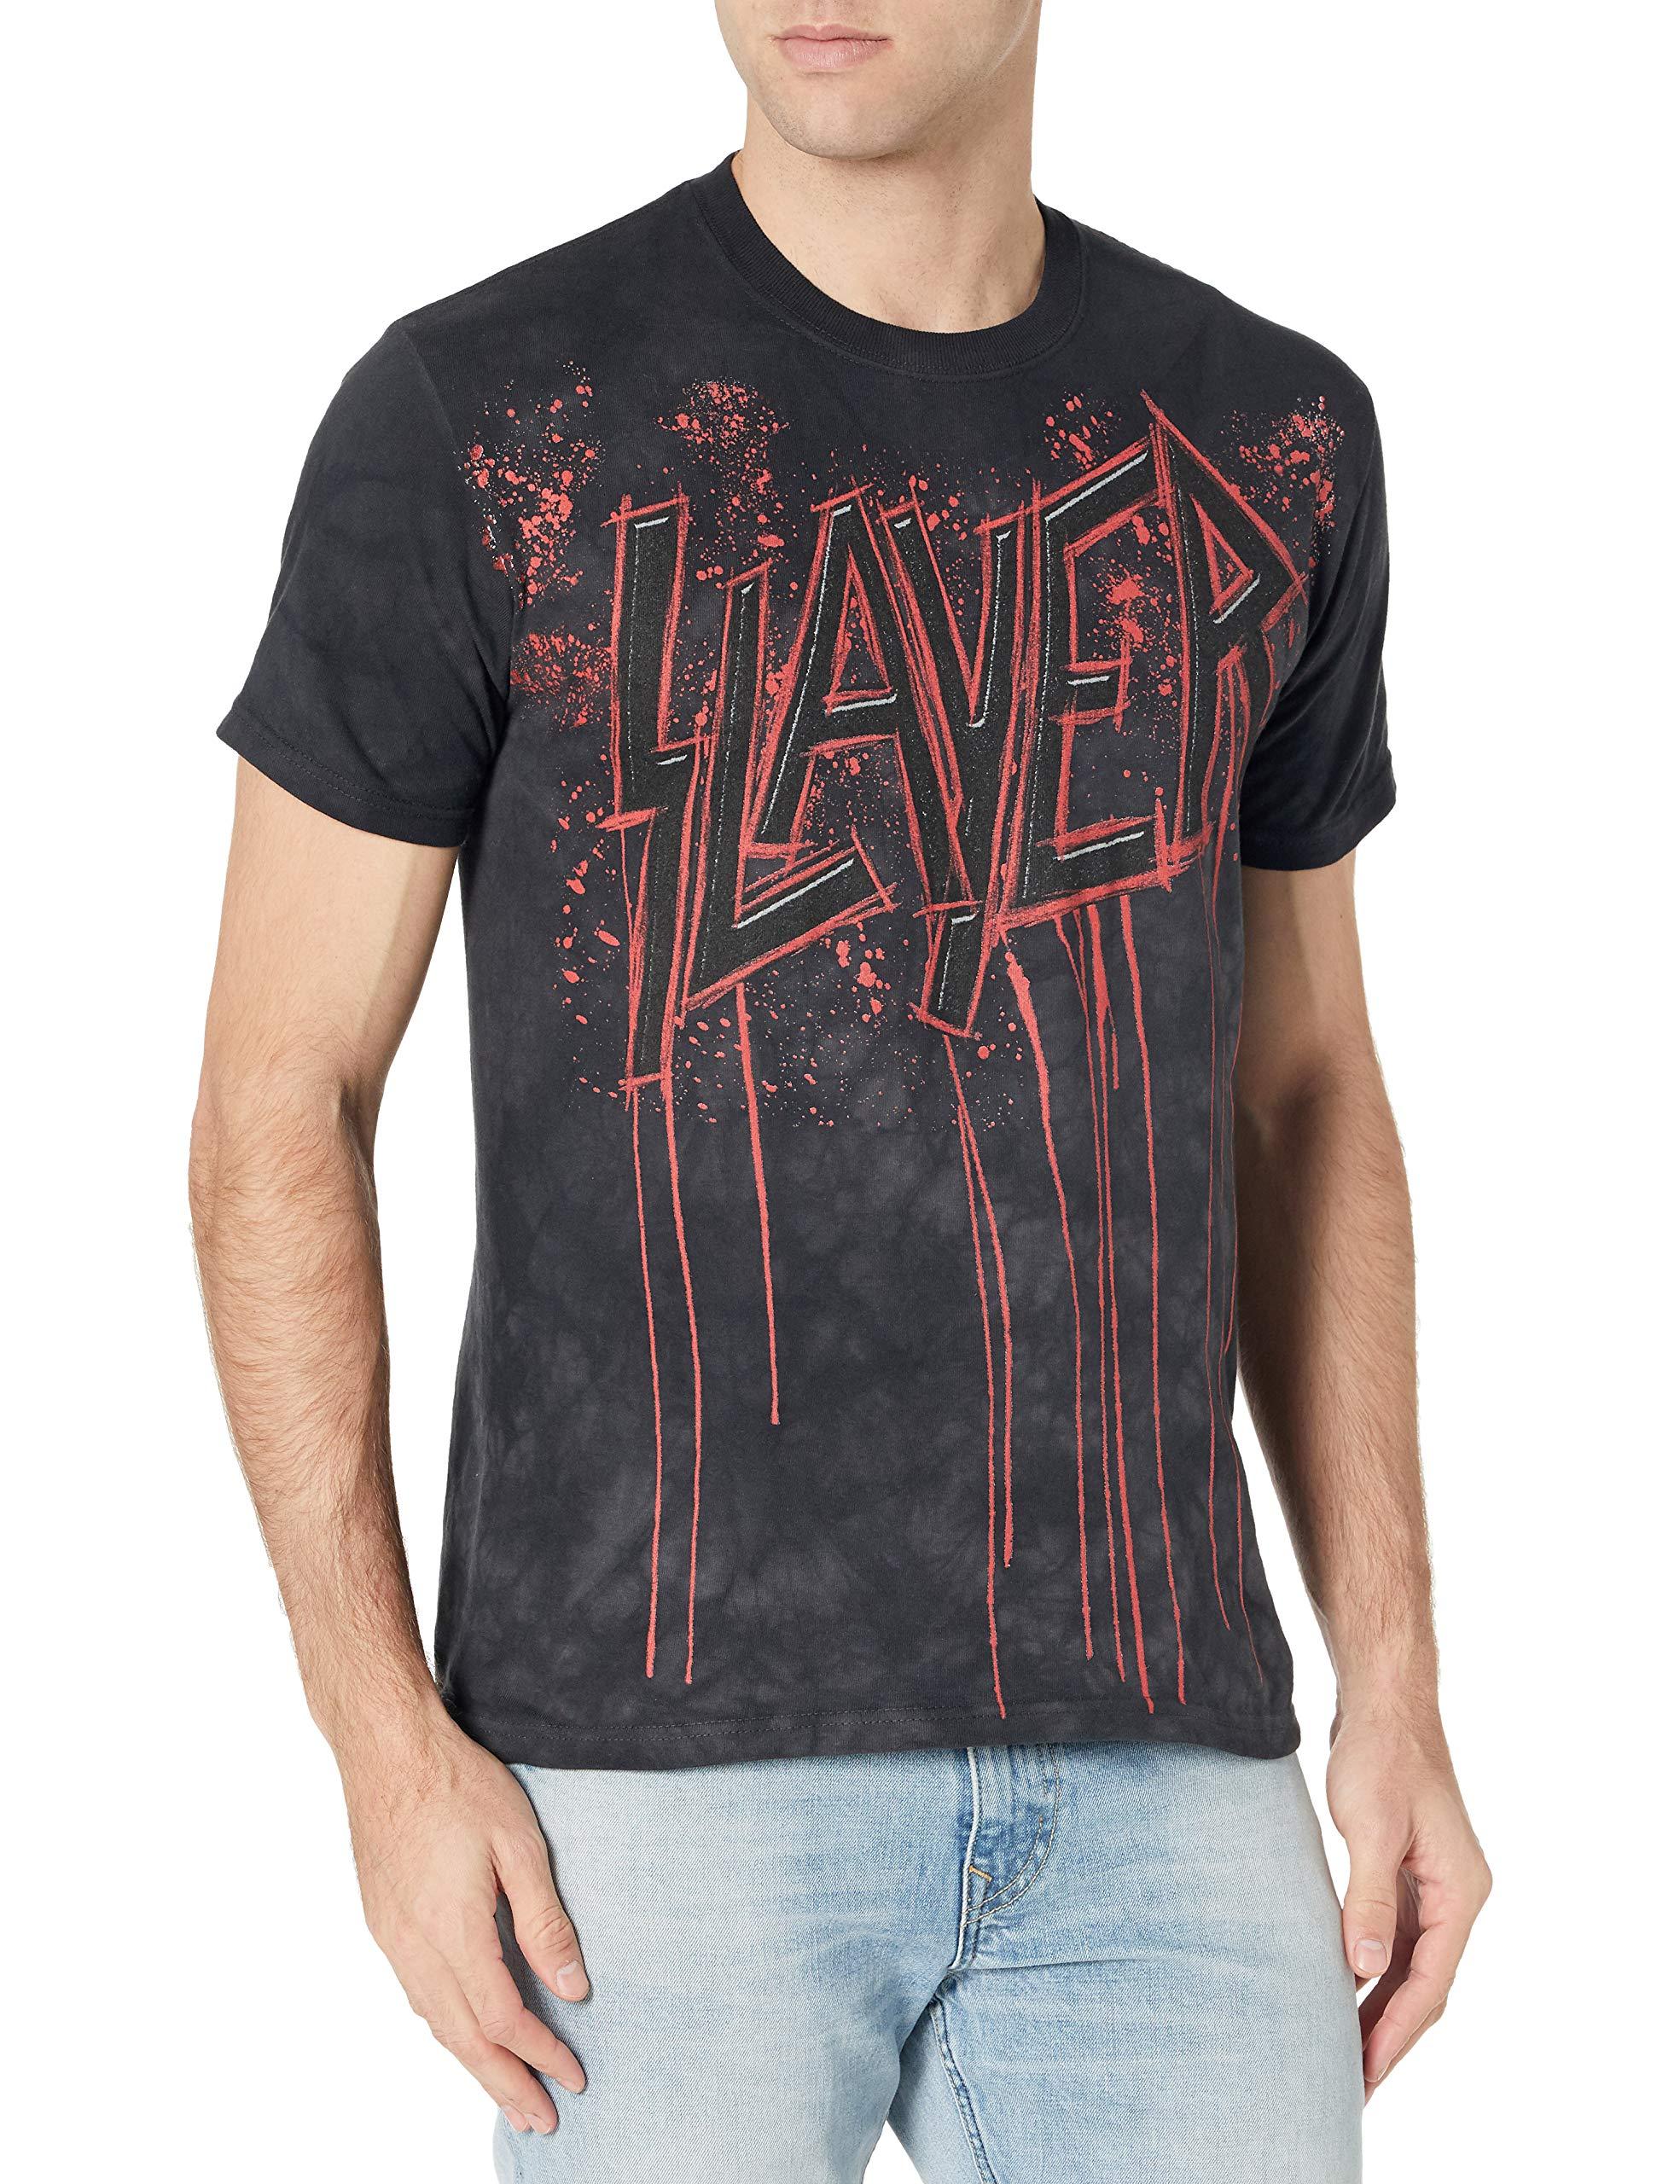 Men's Slayer Raining Blood T-Shirt